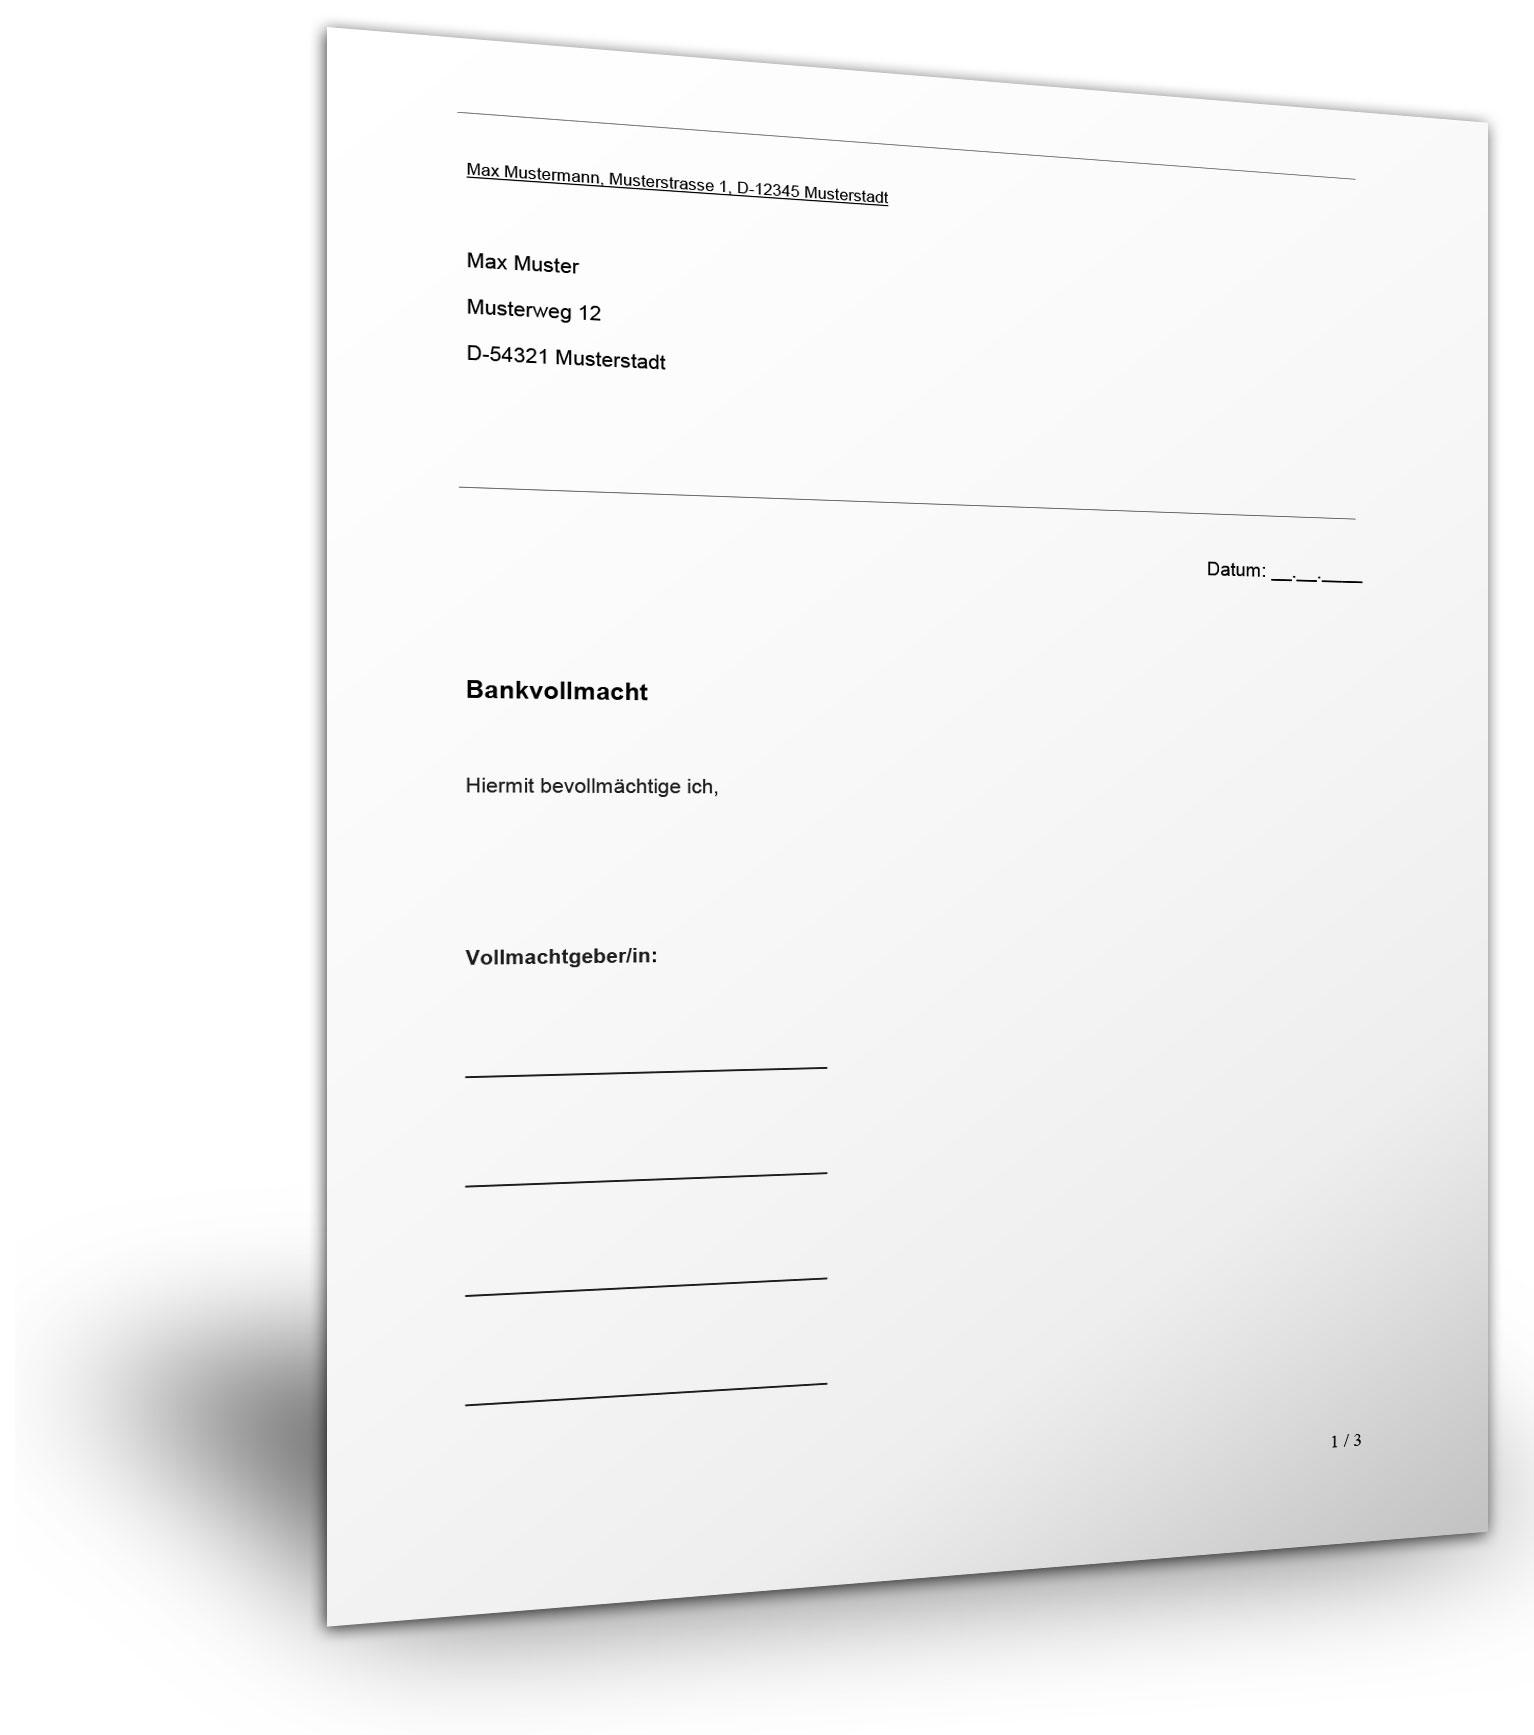 download Biomedizinische Technik 4: Technische Sondergebiete